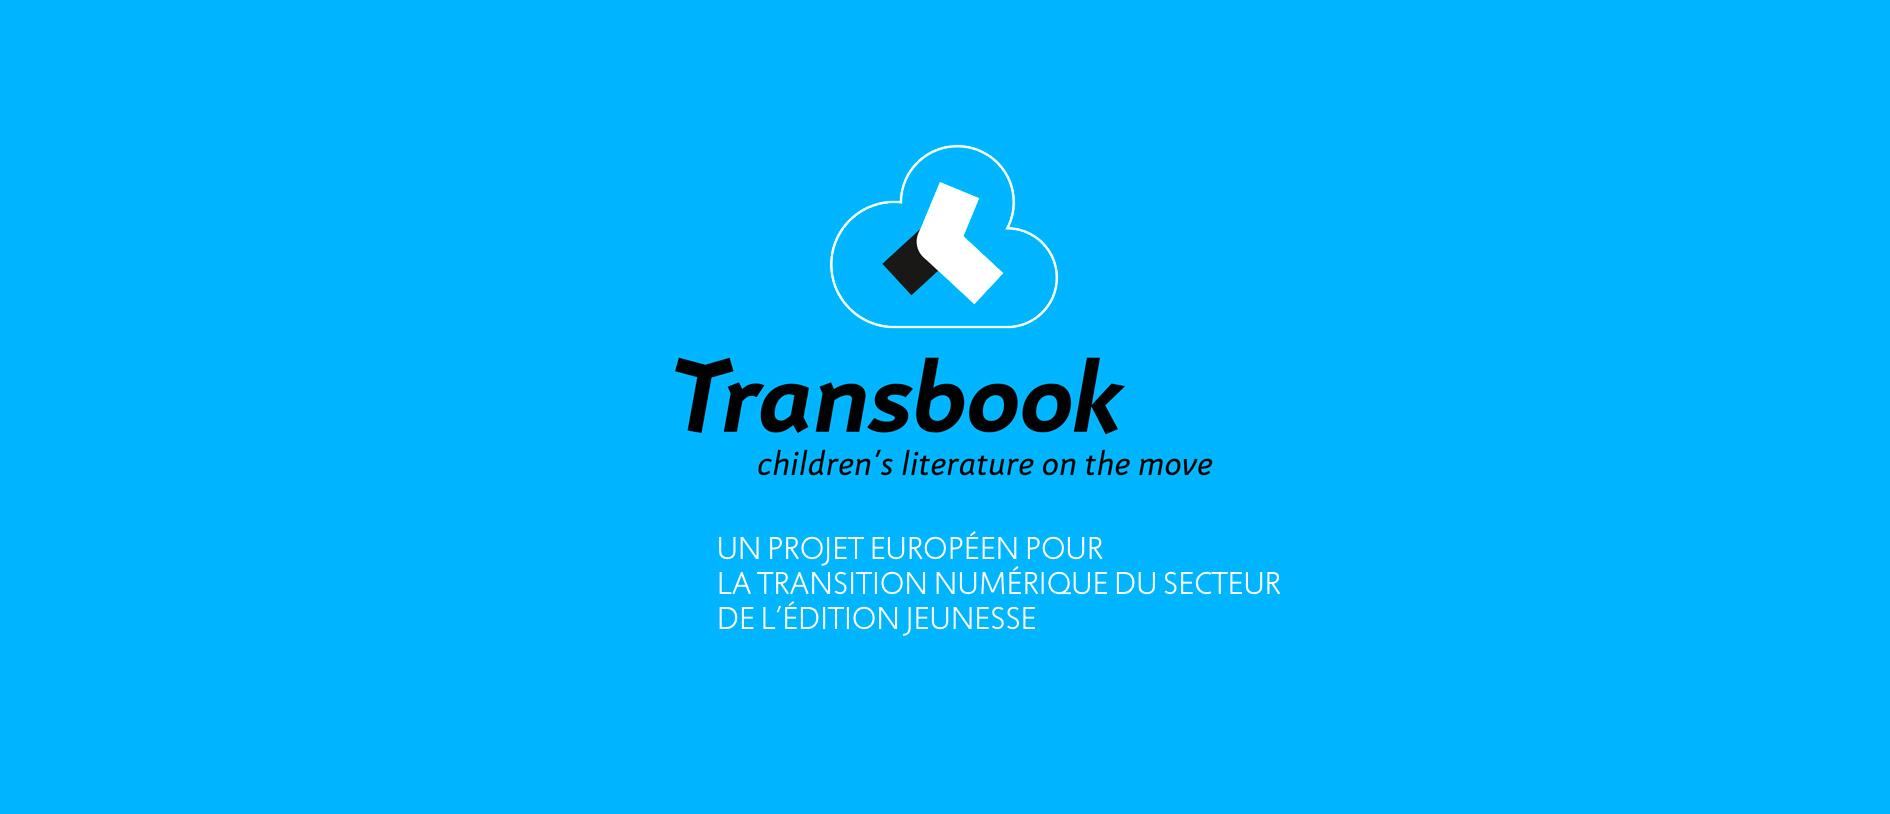 transbook.jpg